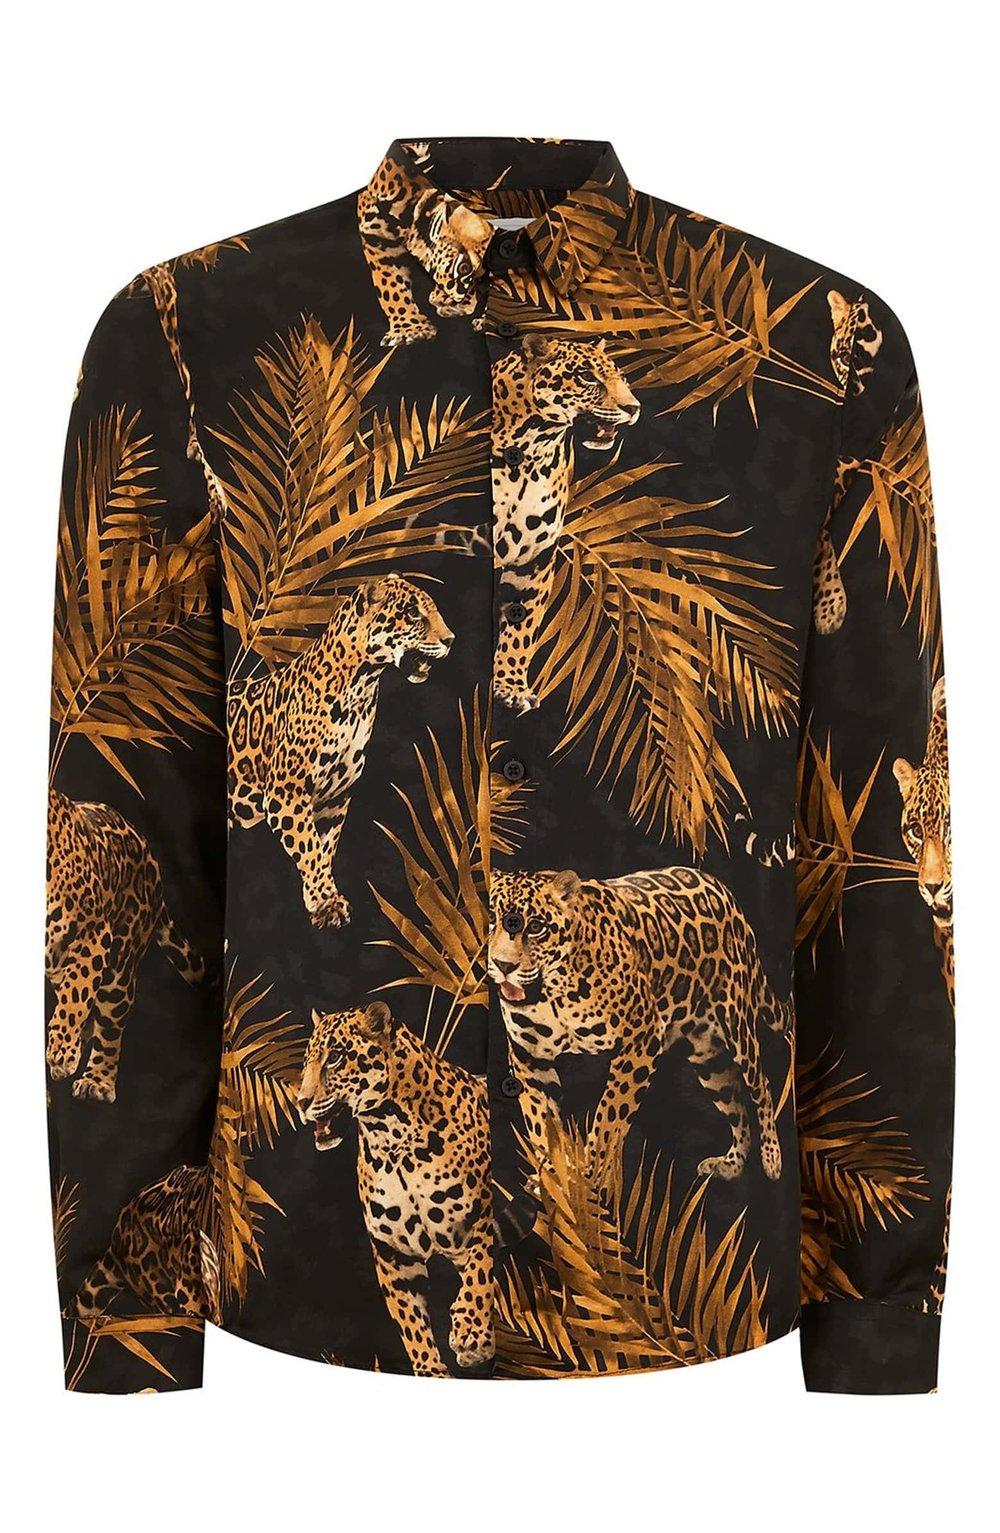 Topman Leopard Print shirt.jpeg